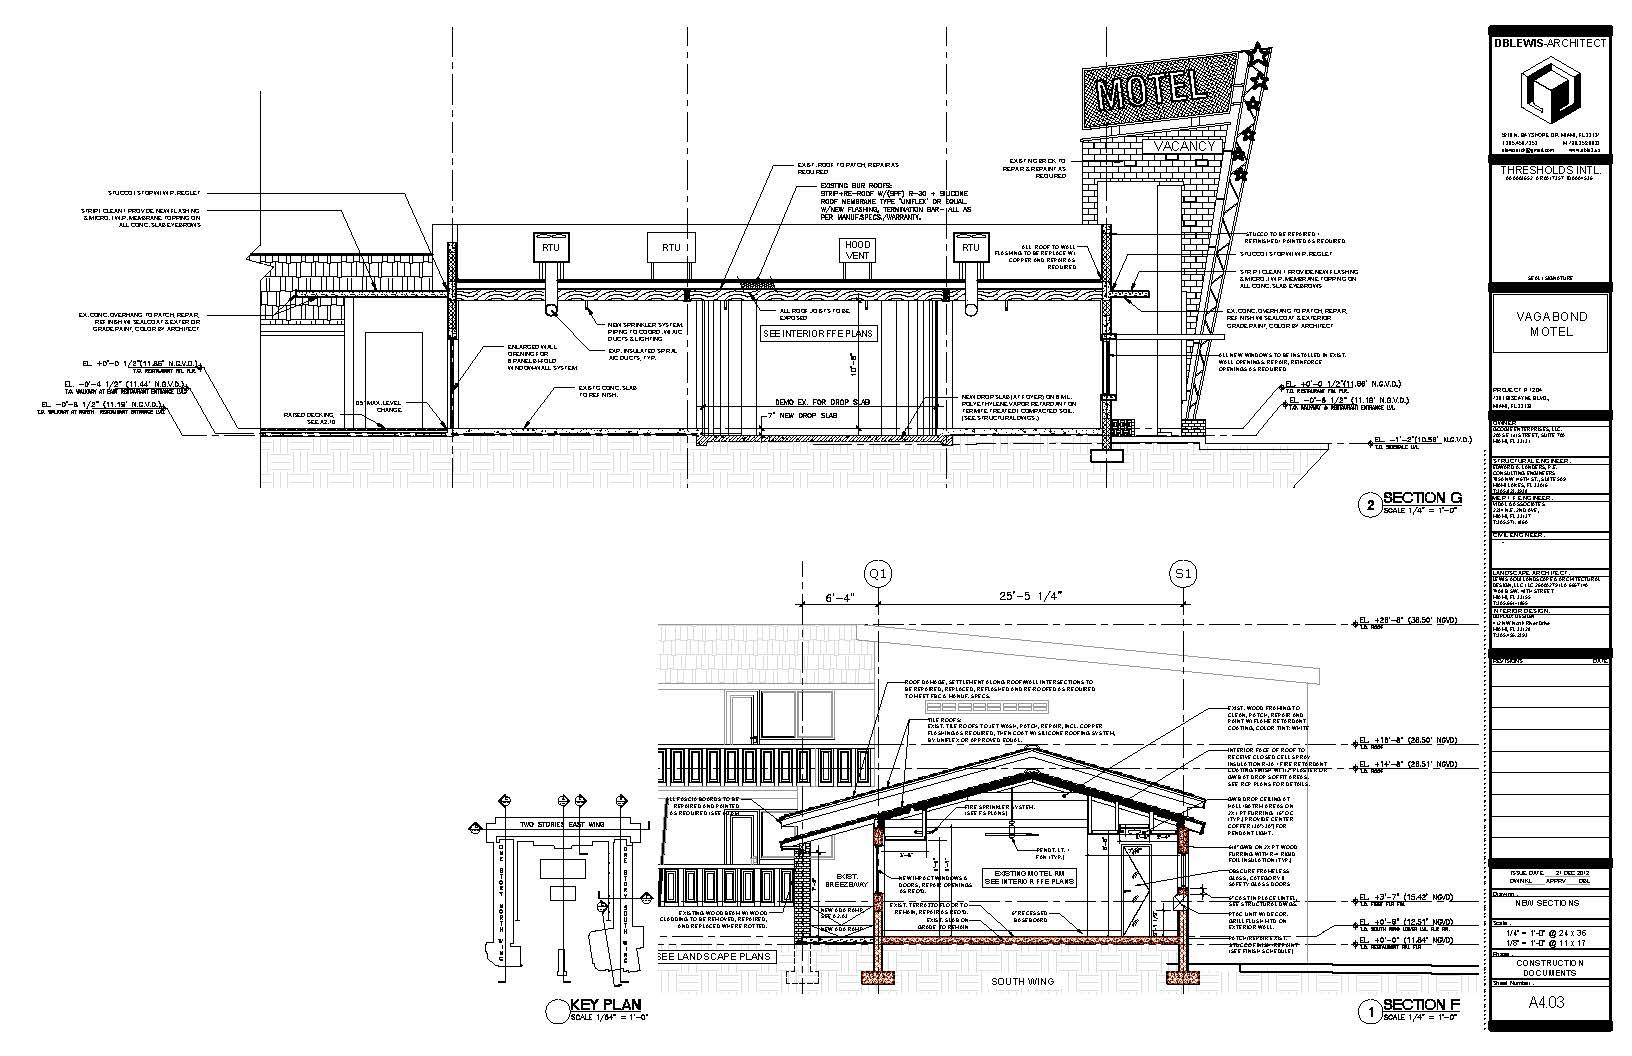 Vagabond Motel. Sections G & F